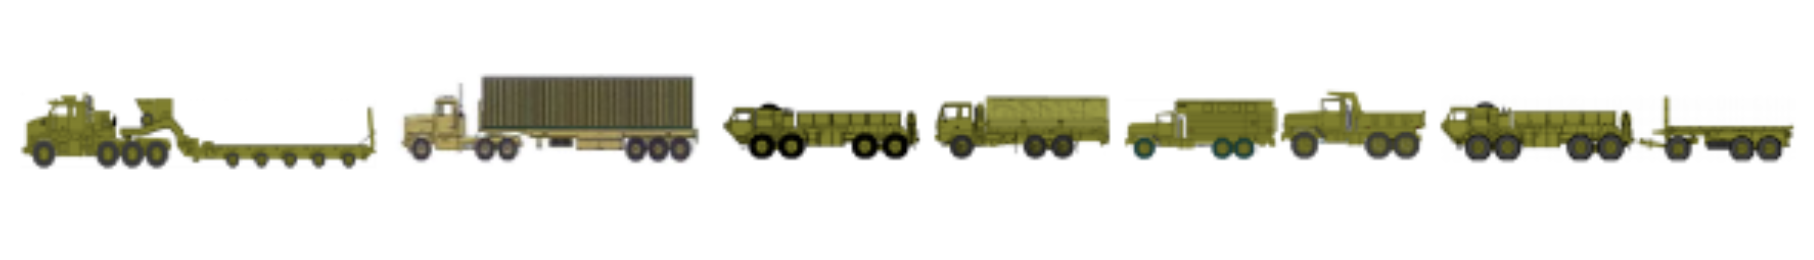 Skills test waiver sample trucks